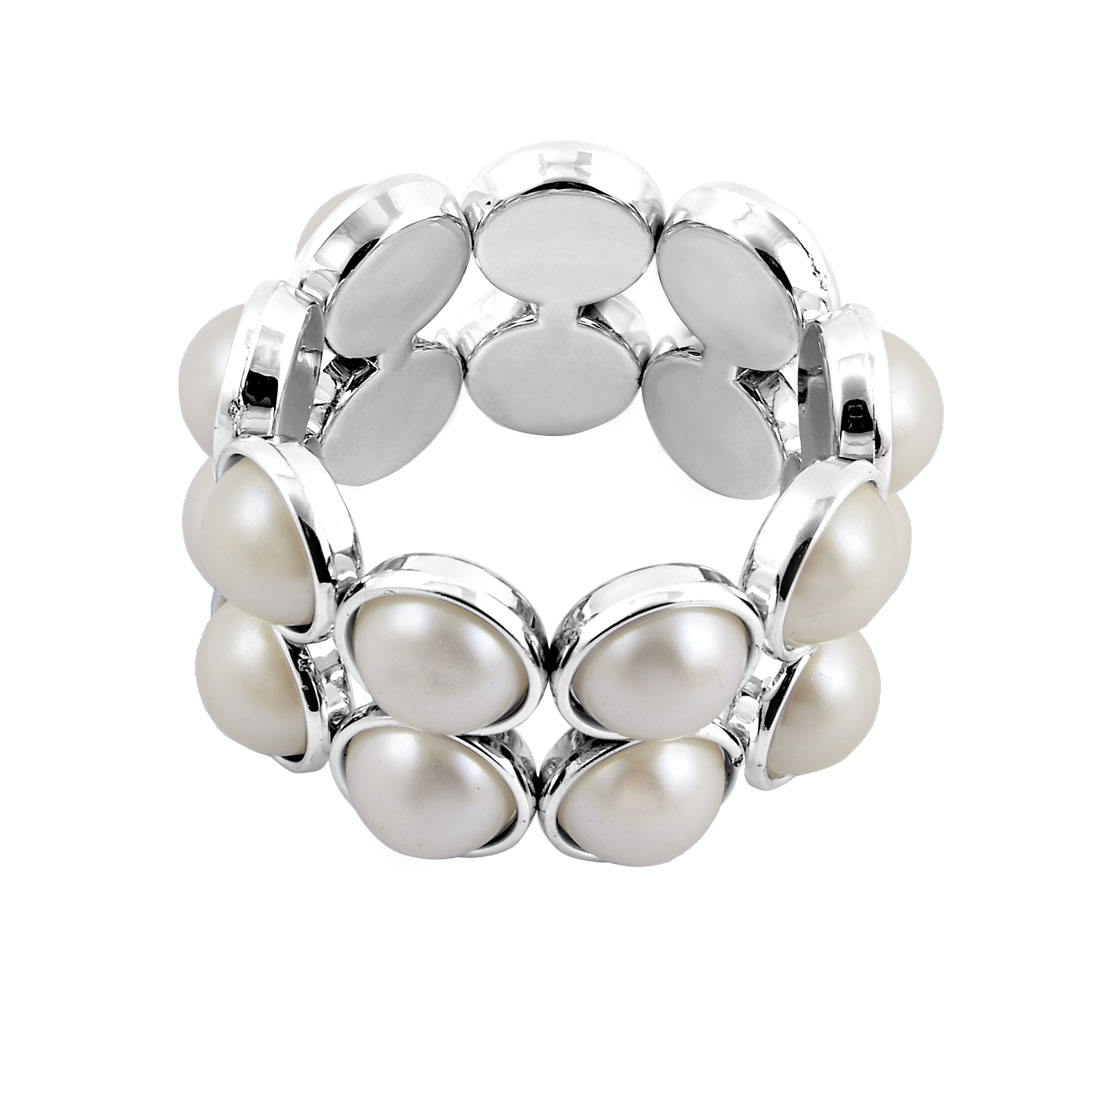 Lady Plastic Imitation Pearl Inlaid 2 Rows Elastic Cord Bracelet Silver Tone - image 2 de 2